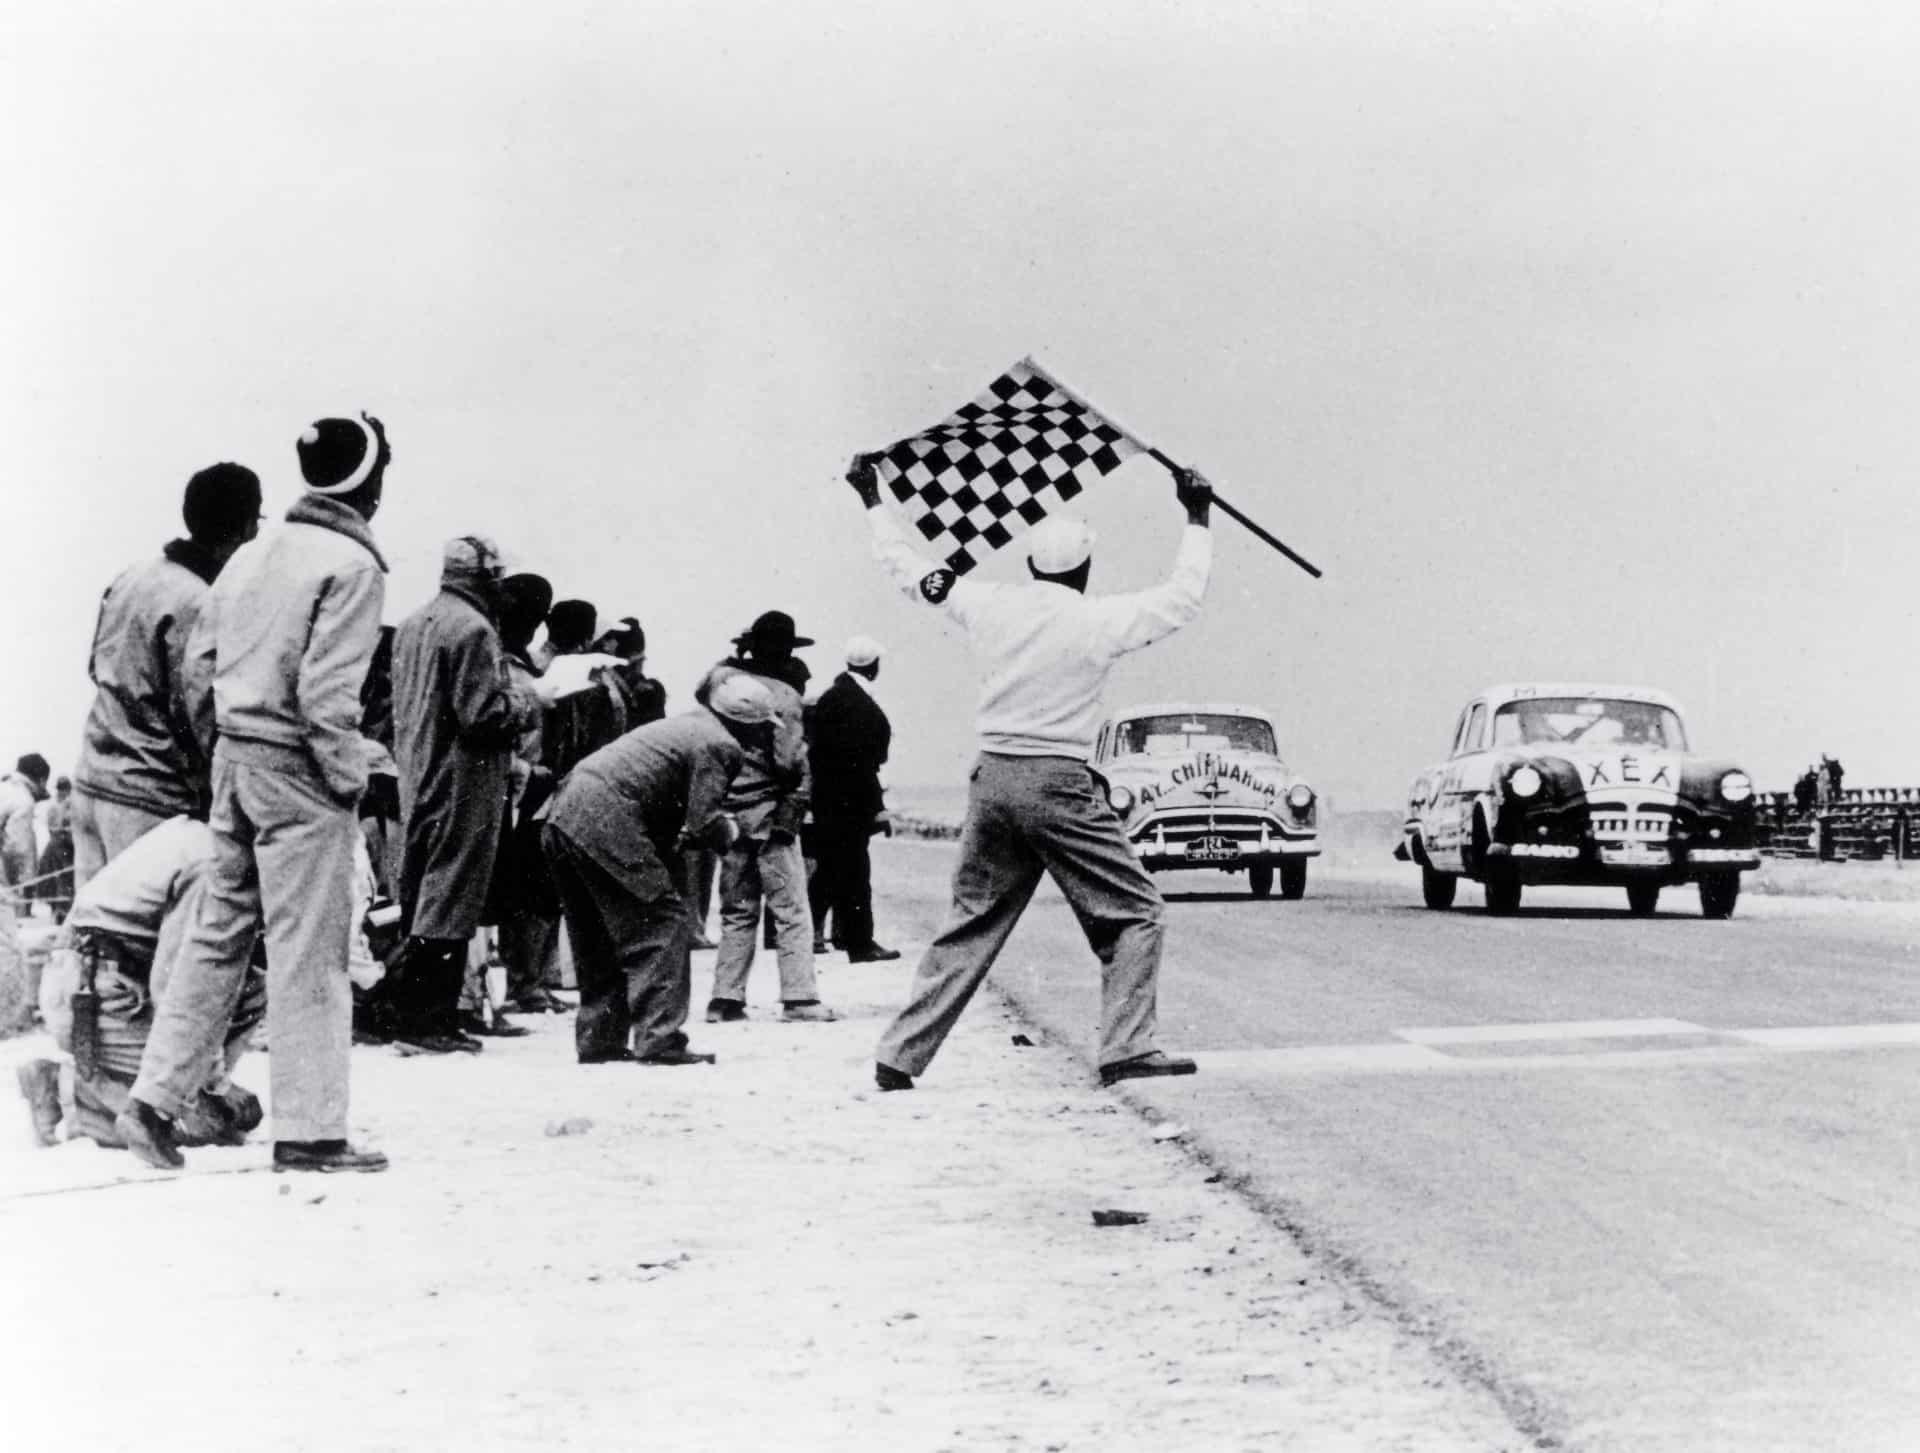 Carrera Panamericana der 1950-er Jahre